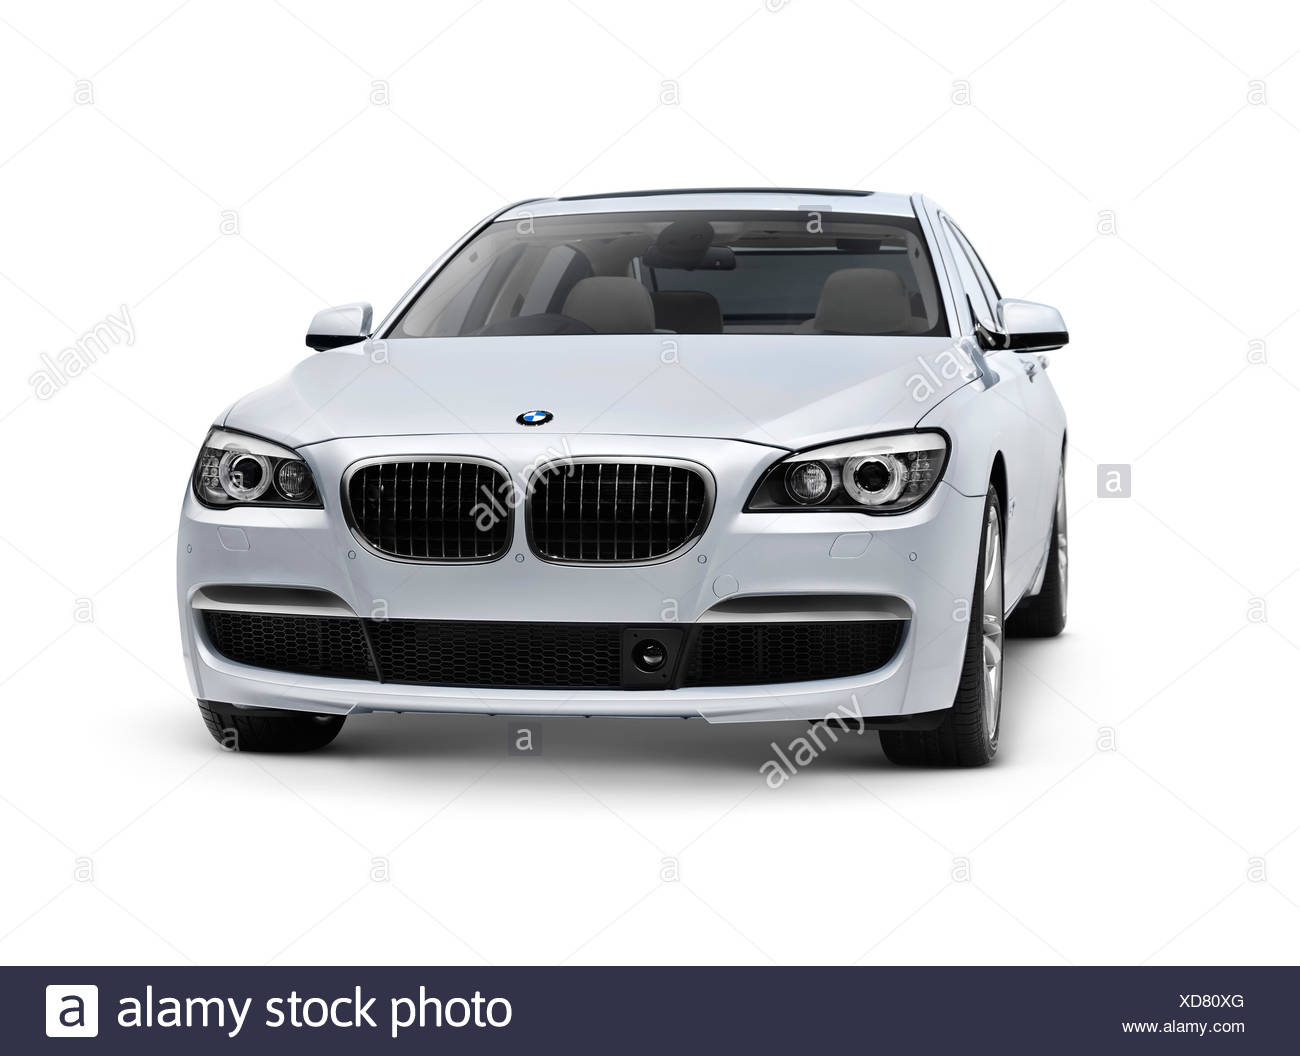 2010 BMW 760Li Individual 7 Series luxury sedan car - Stock Image